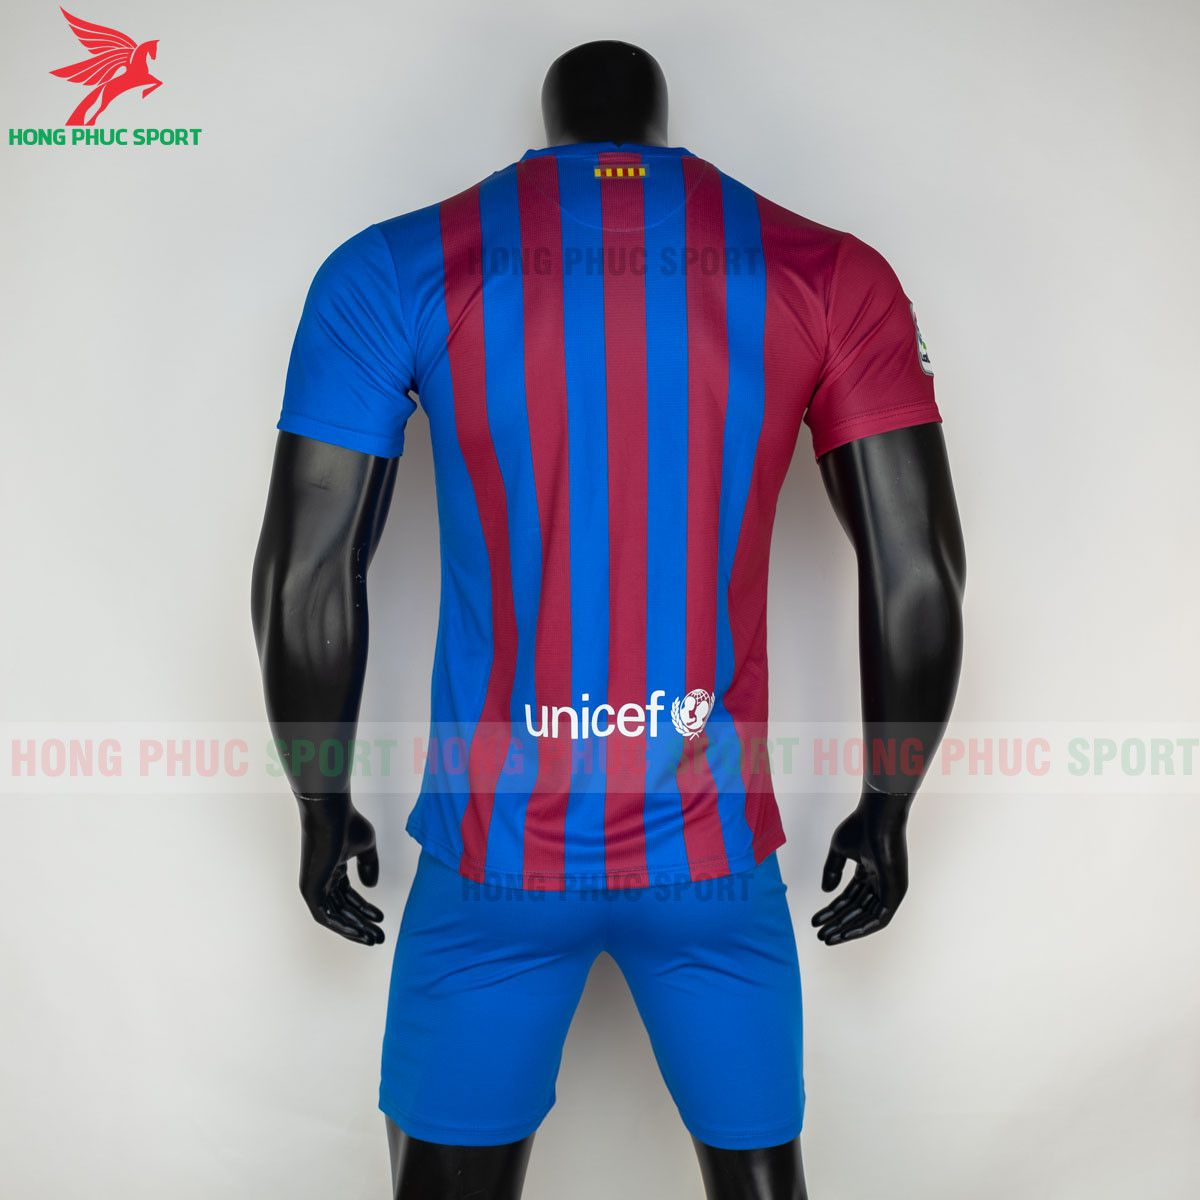 https://cdn.hongphucsport.com/unsafe/s4.shopbay.vn/files/285/ao-bong-da-barcelona-2021-2022-san-nha-hang-thai-8-60d2fcf285825.jpg